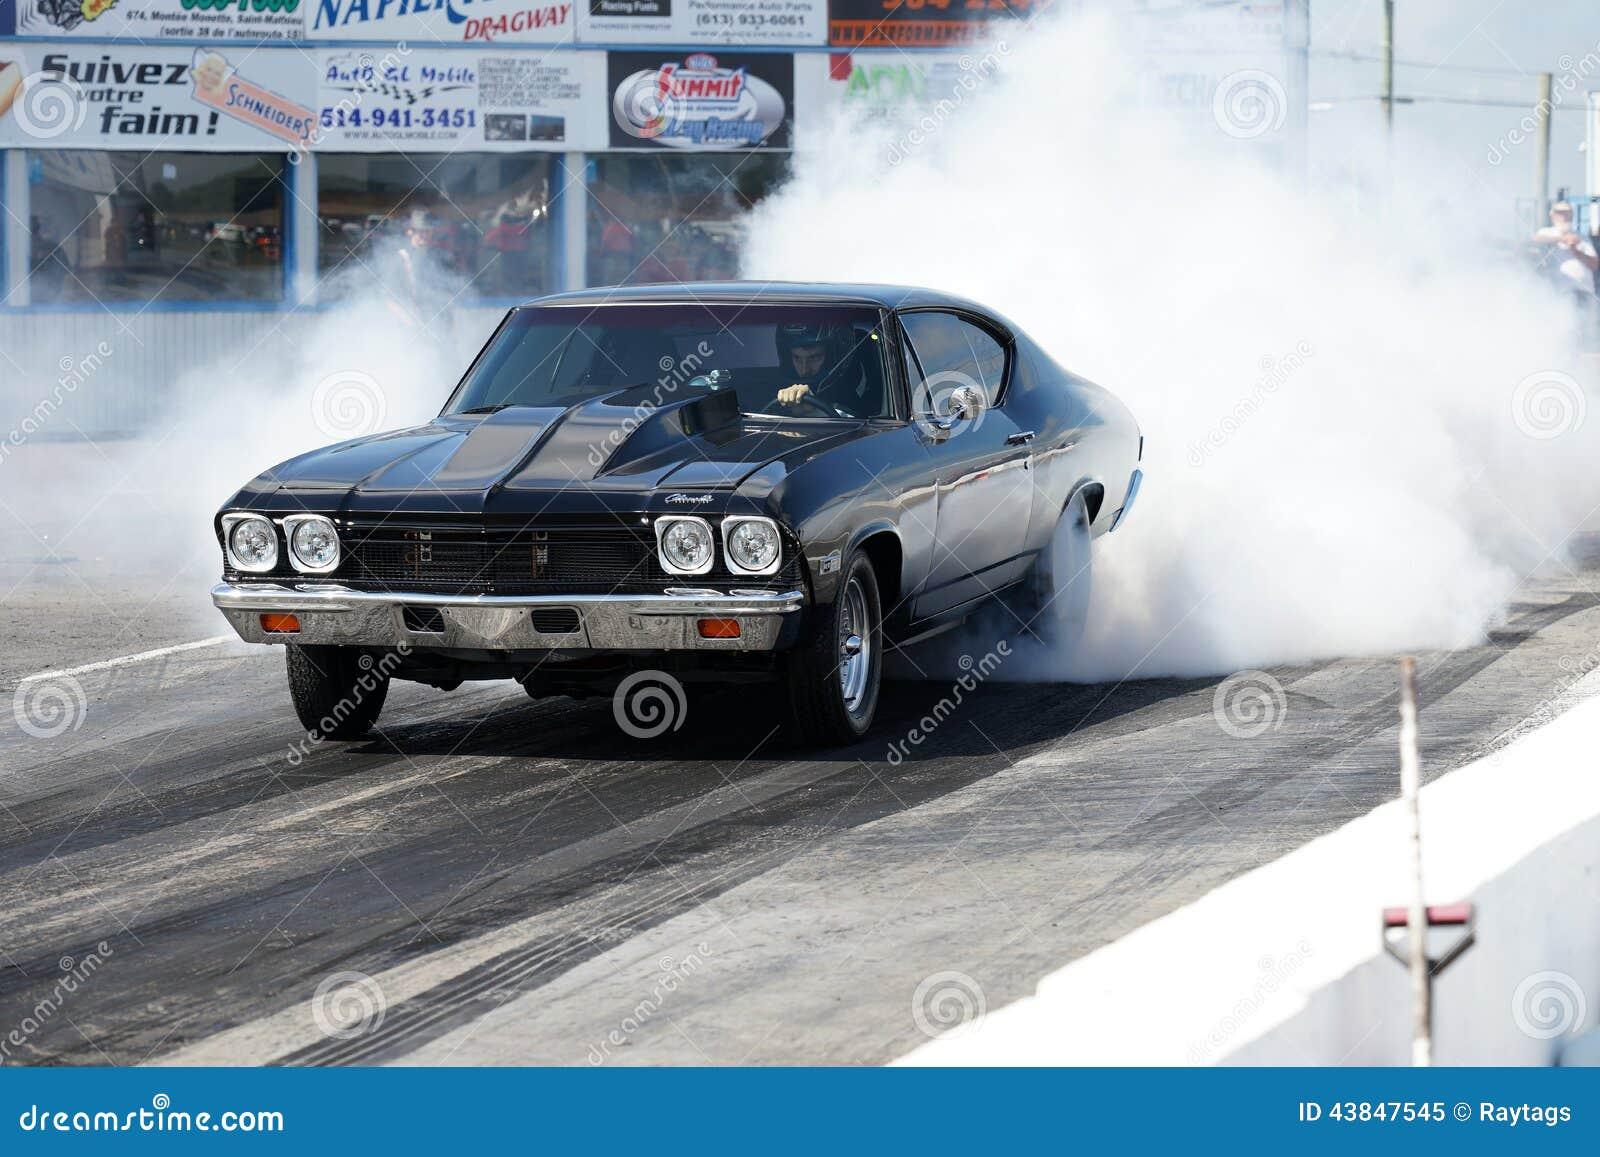 Dave Sinclair Gmc >> Saint John Used Car Used Cars Suvs Trucks Used Cars | Autos Post